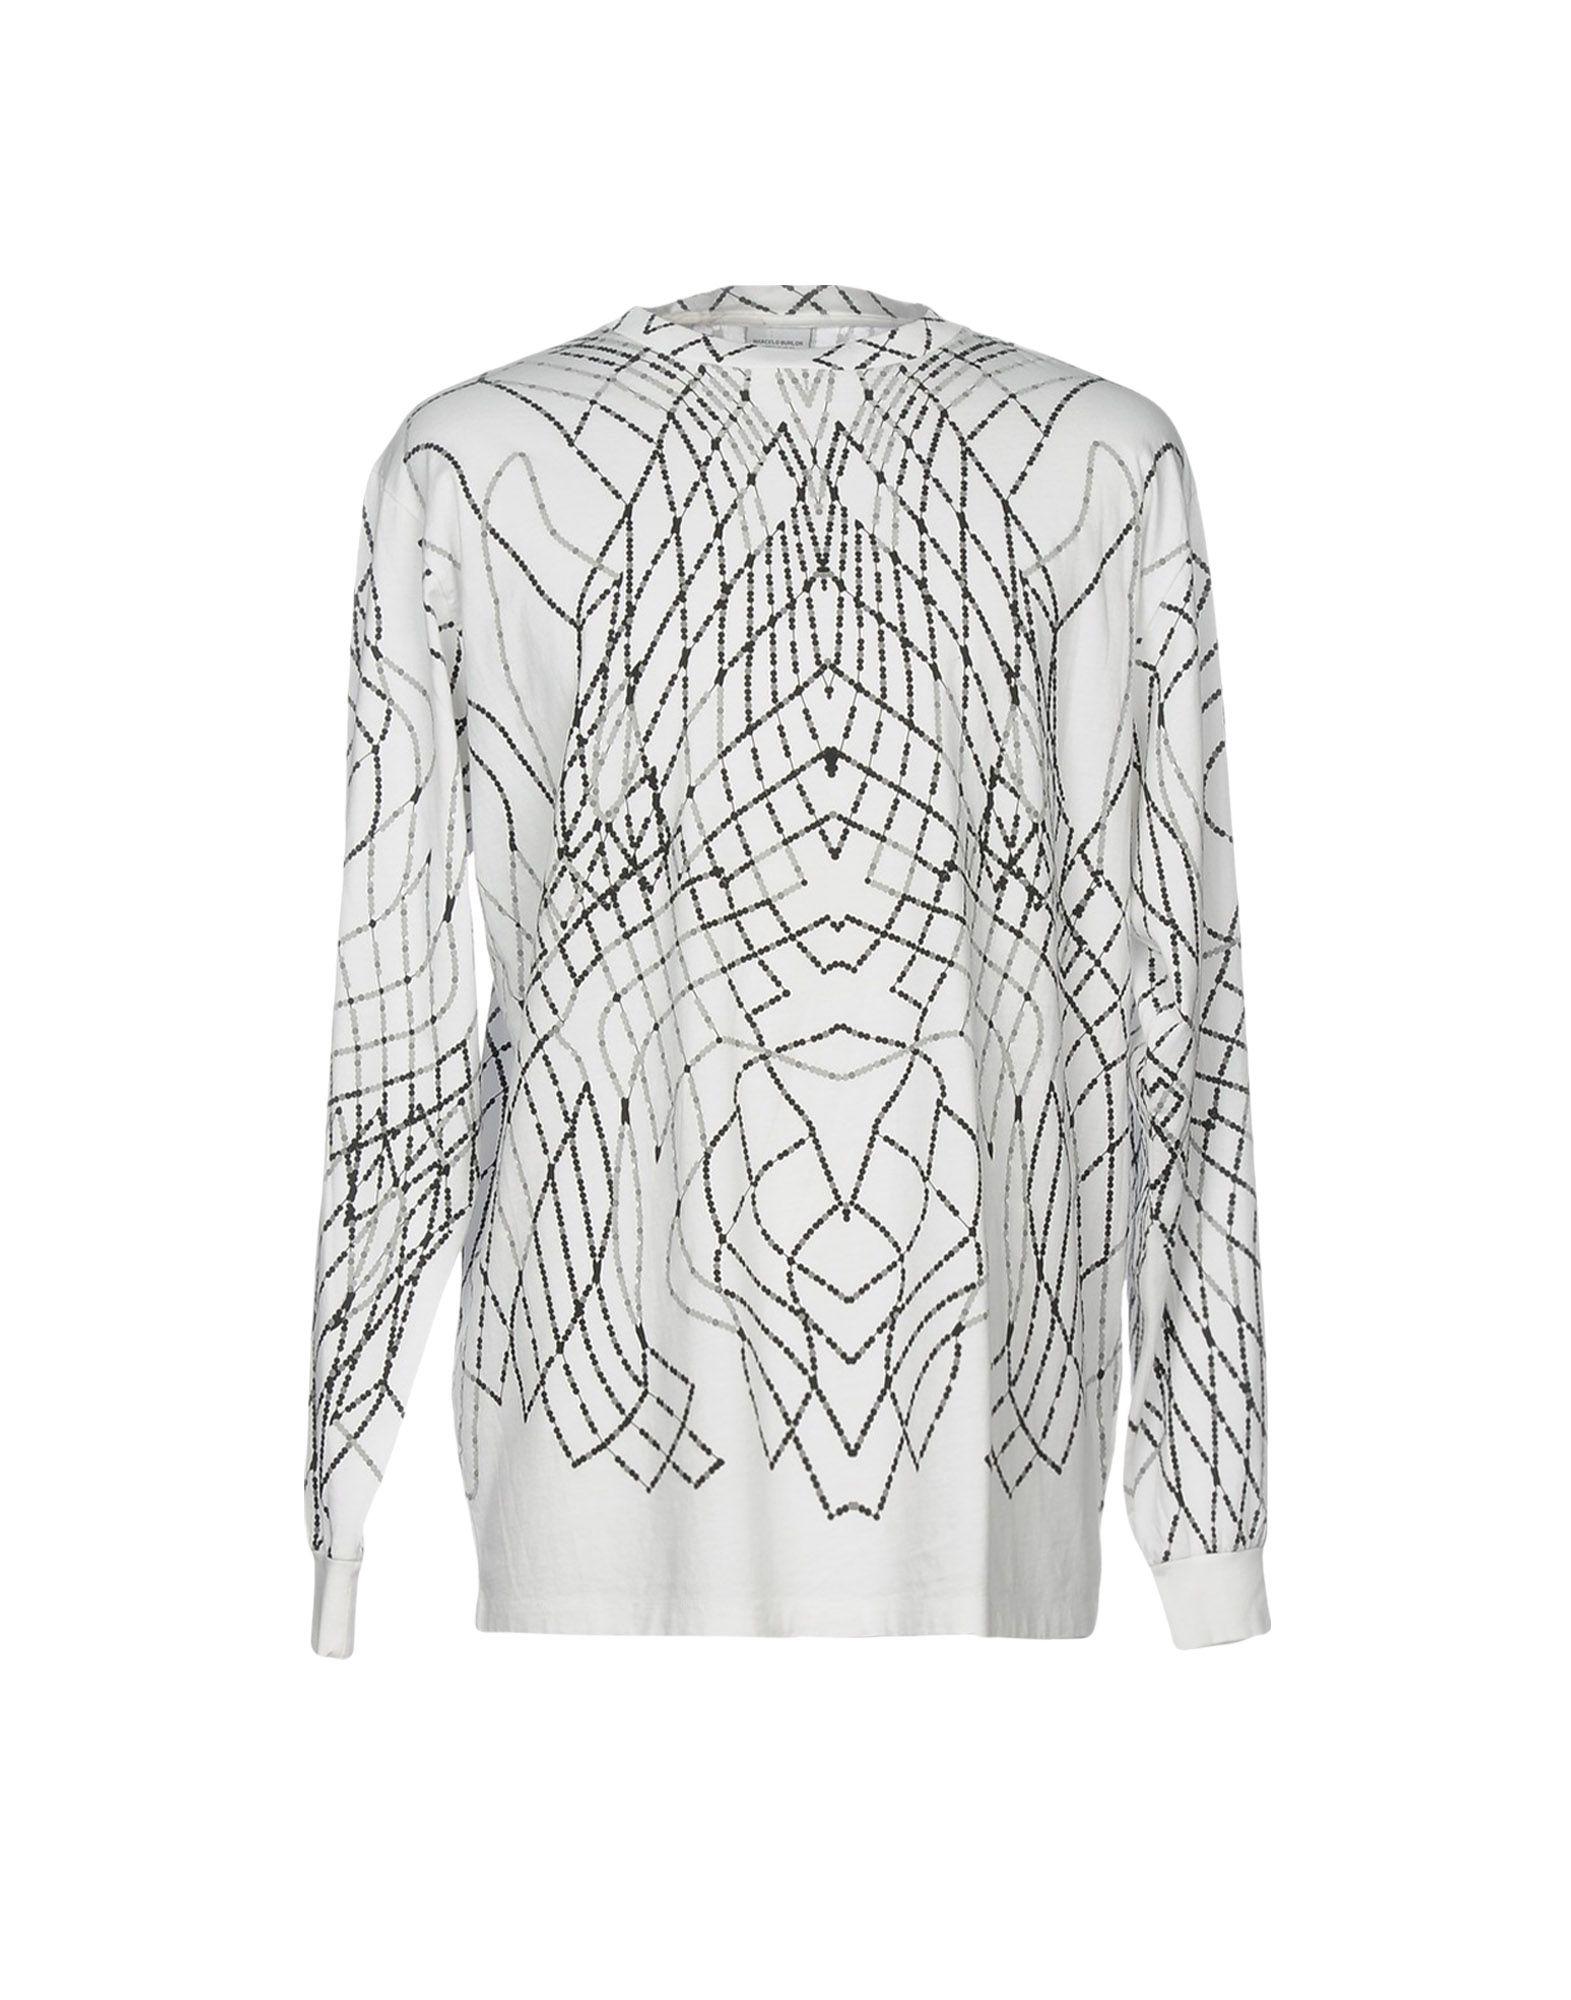 T-Shirt Marcelo Burlon - Uomo - Burlon 12162899RU 611a07